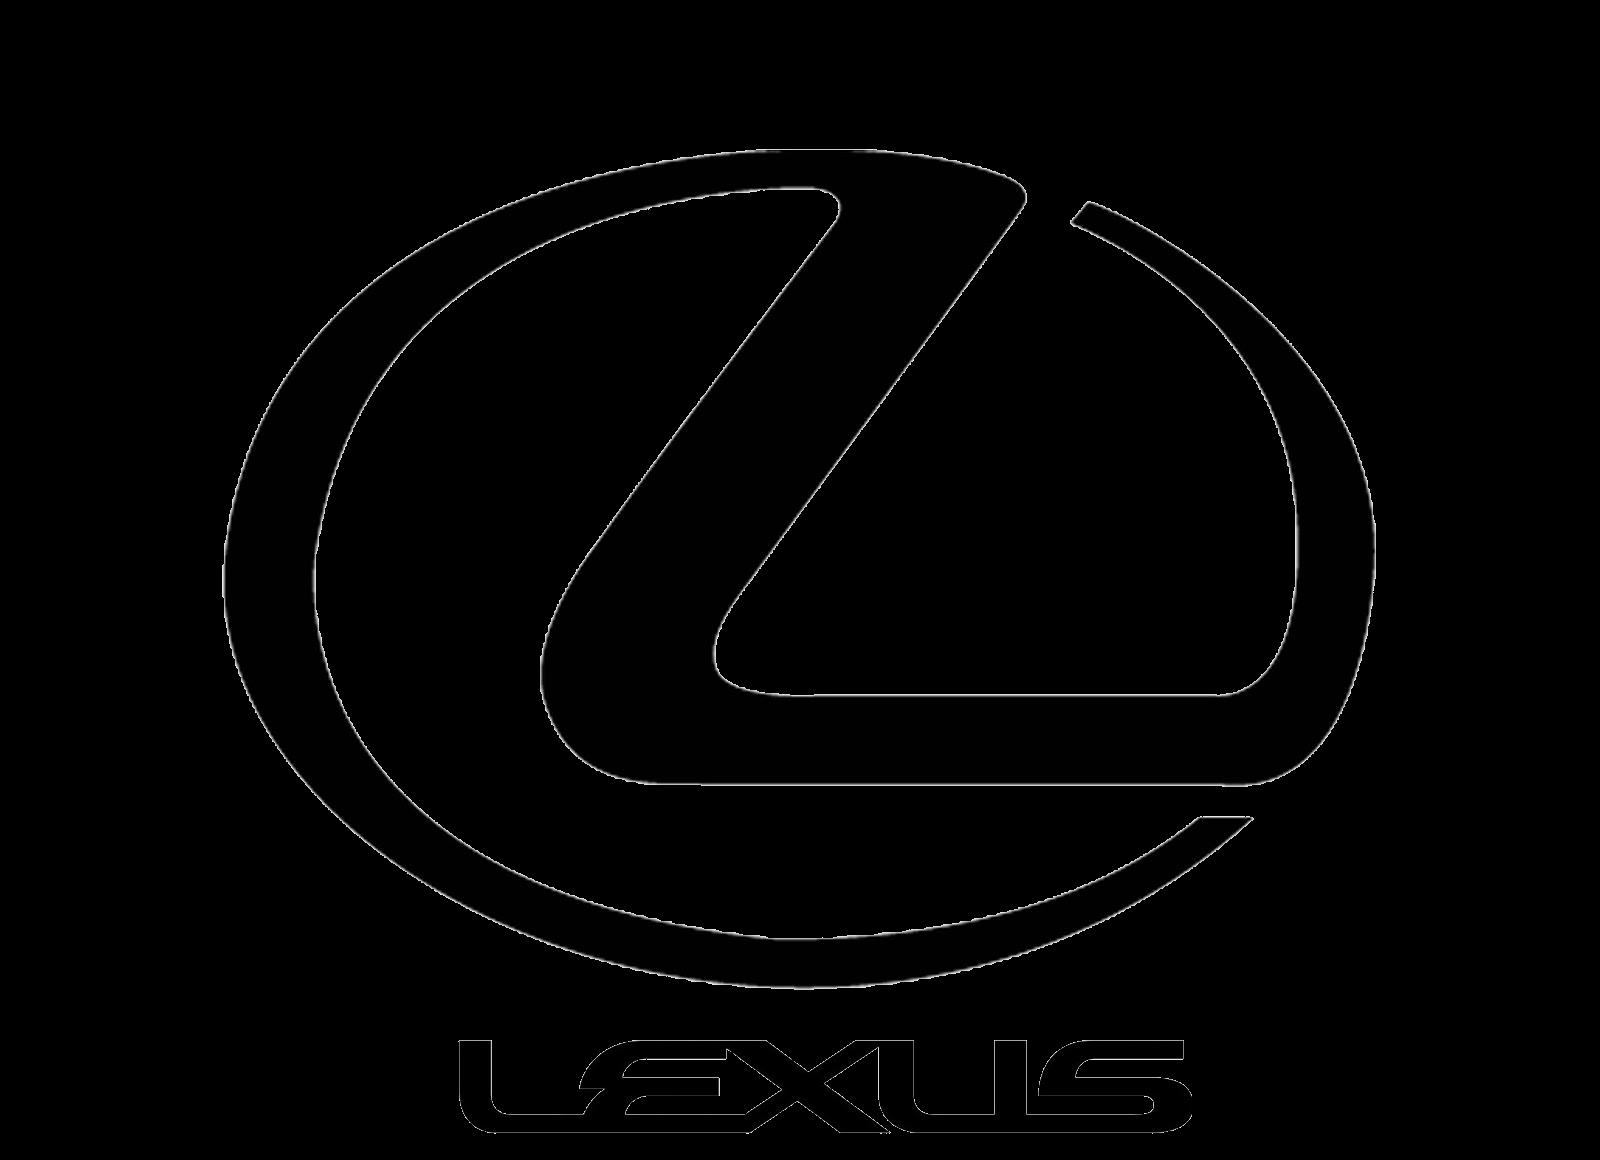 Lexus Car Logo - Lexus Auto Logo Vector PNG - Lexus Auto Vector PNG